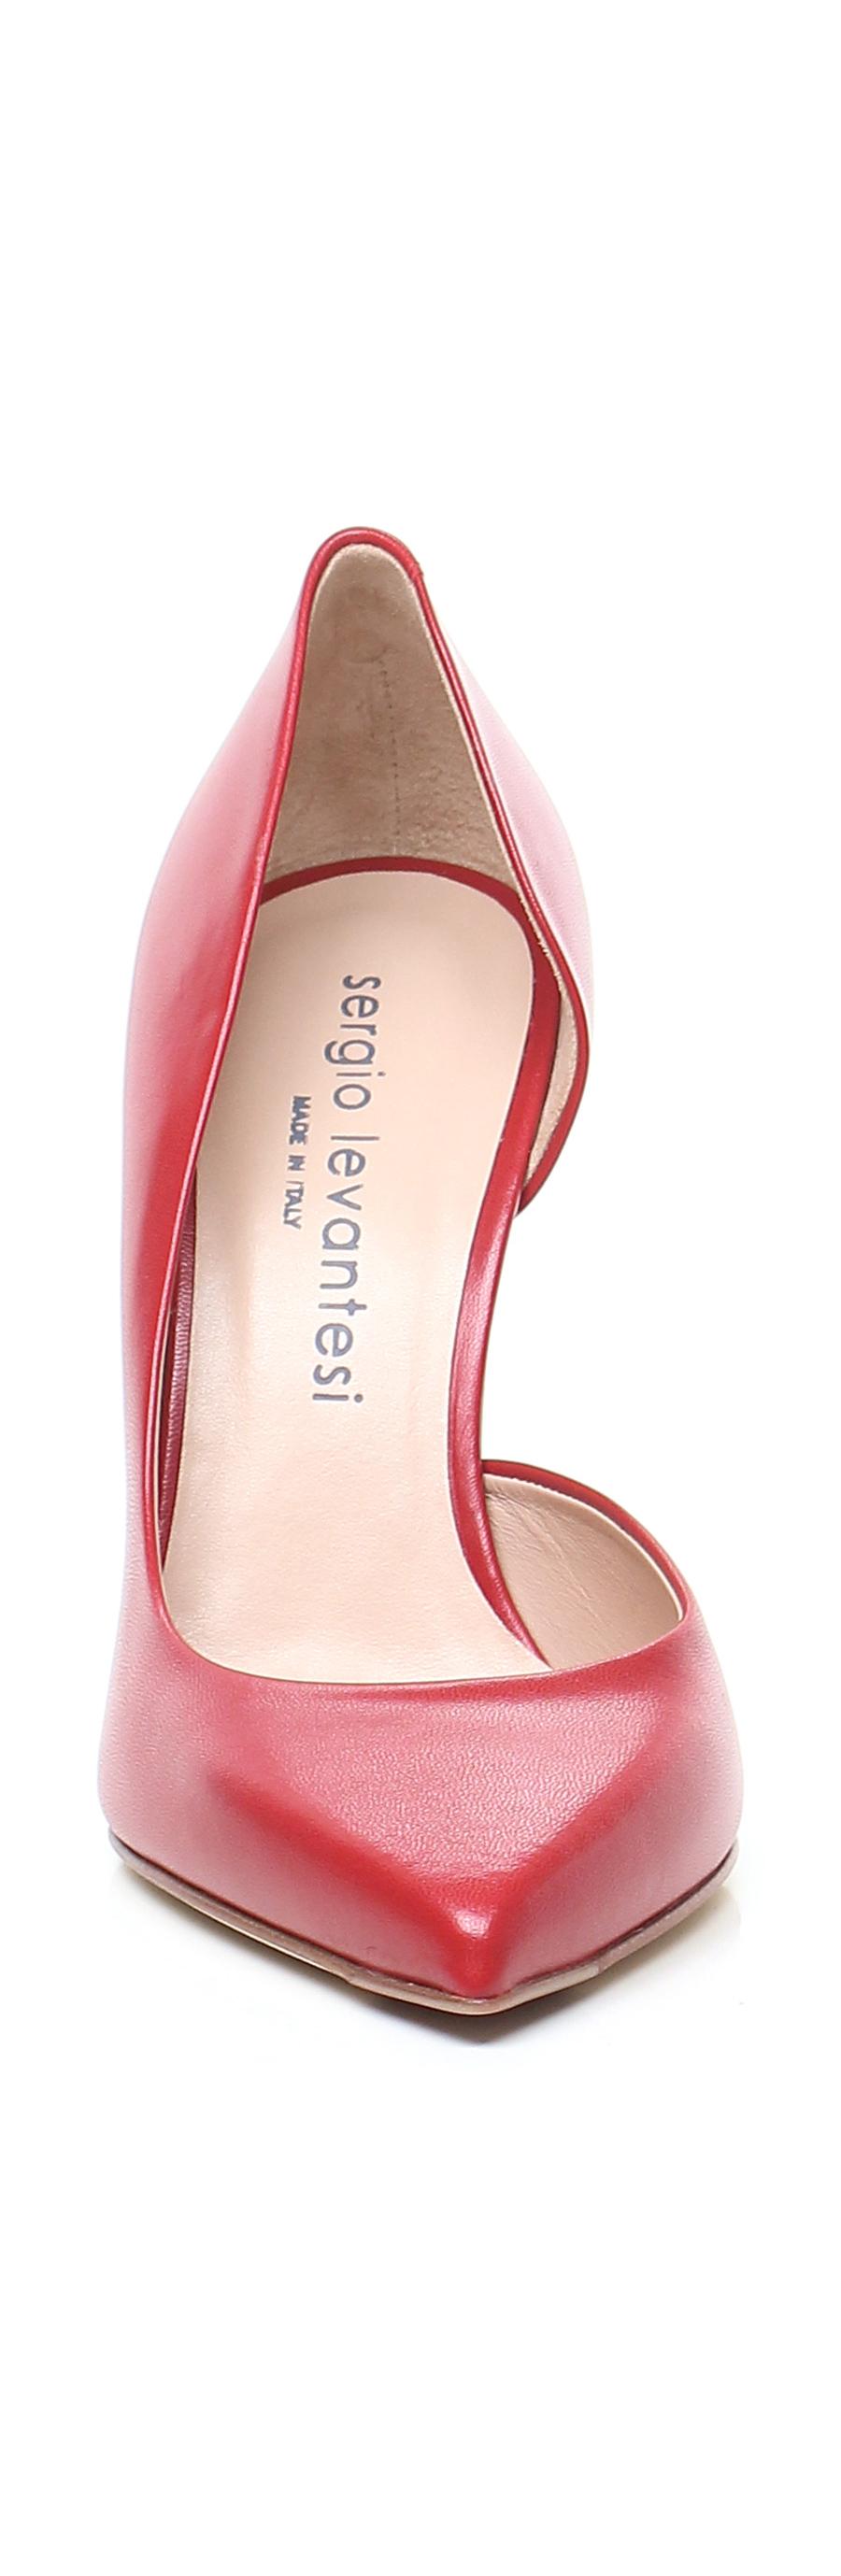 Scarpa Scarpa Scarpa con tacco Rubino Sergio Levantesi 73a2b1